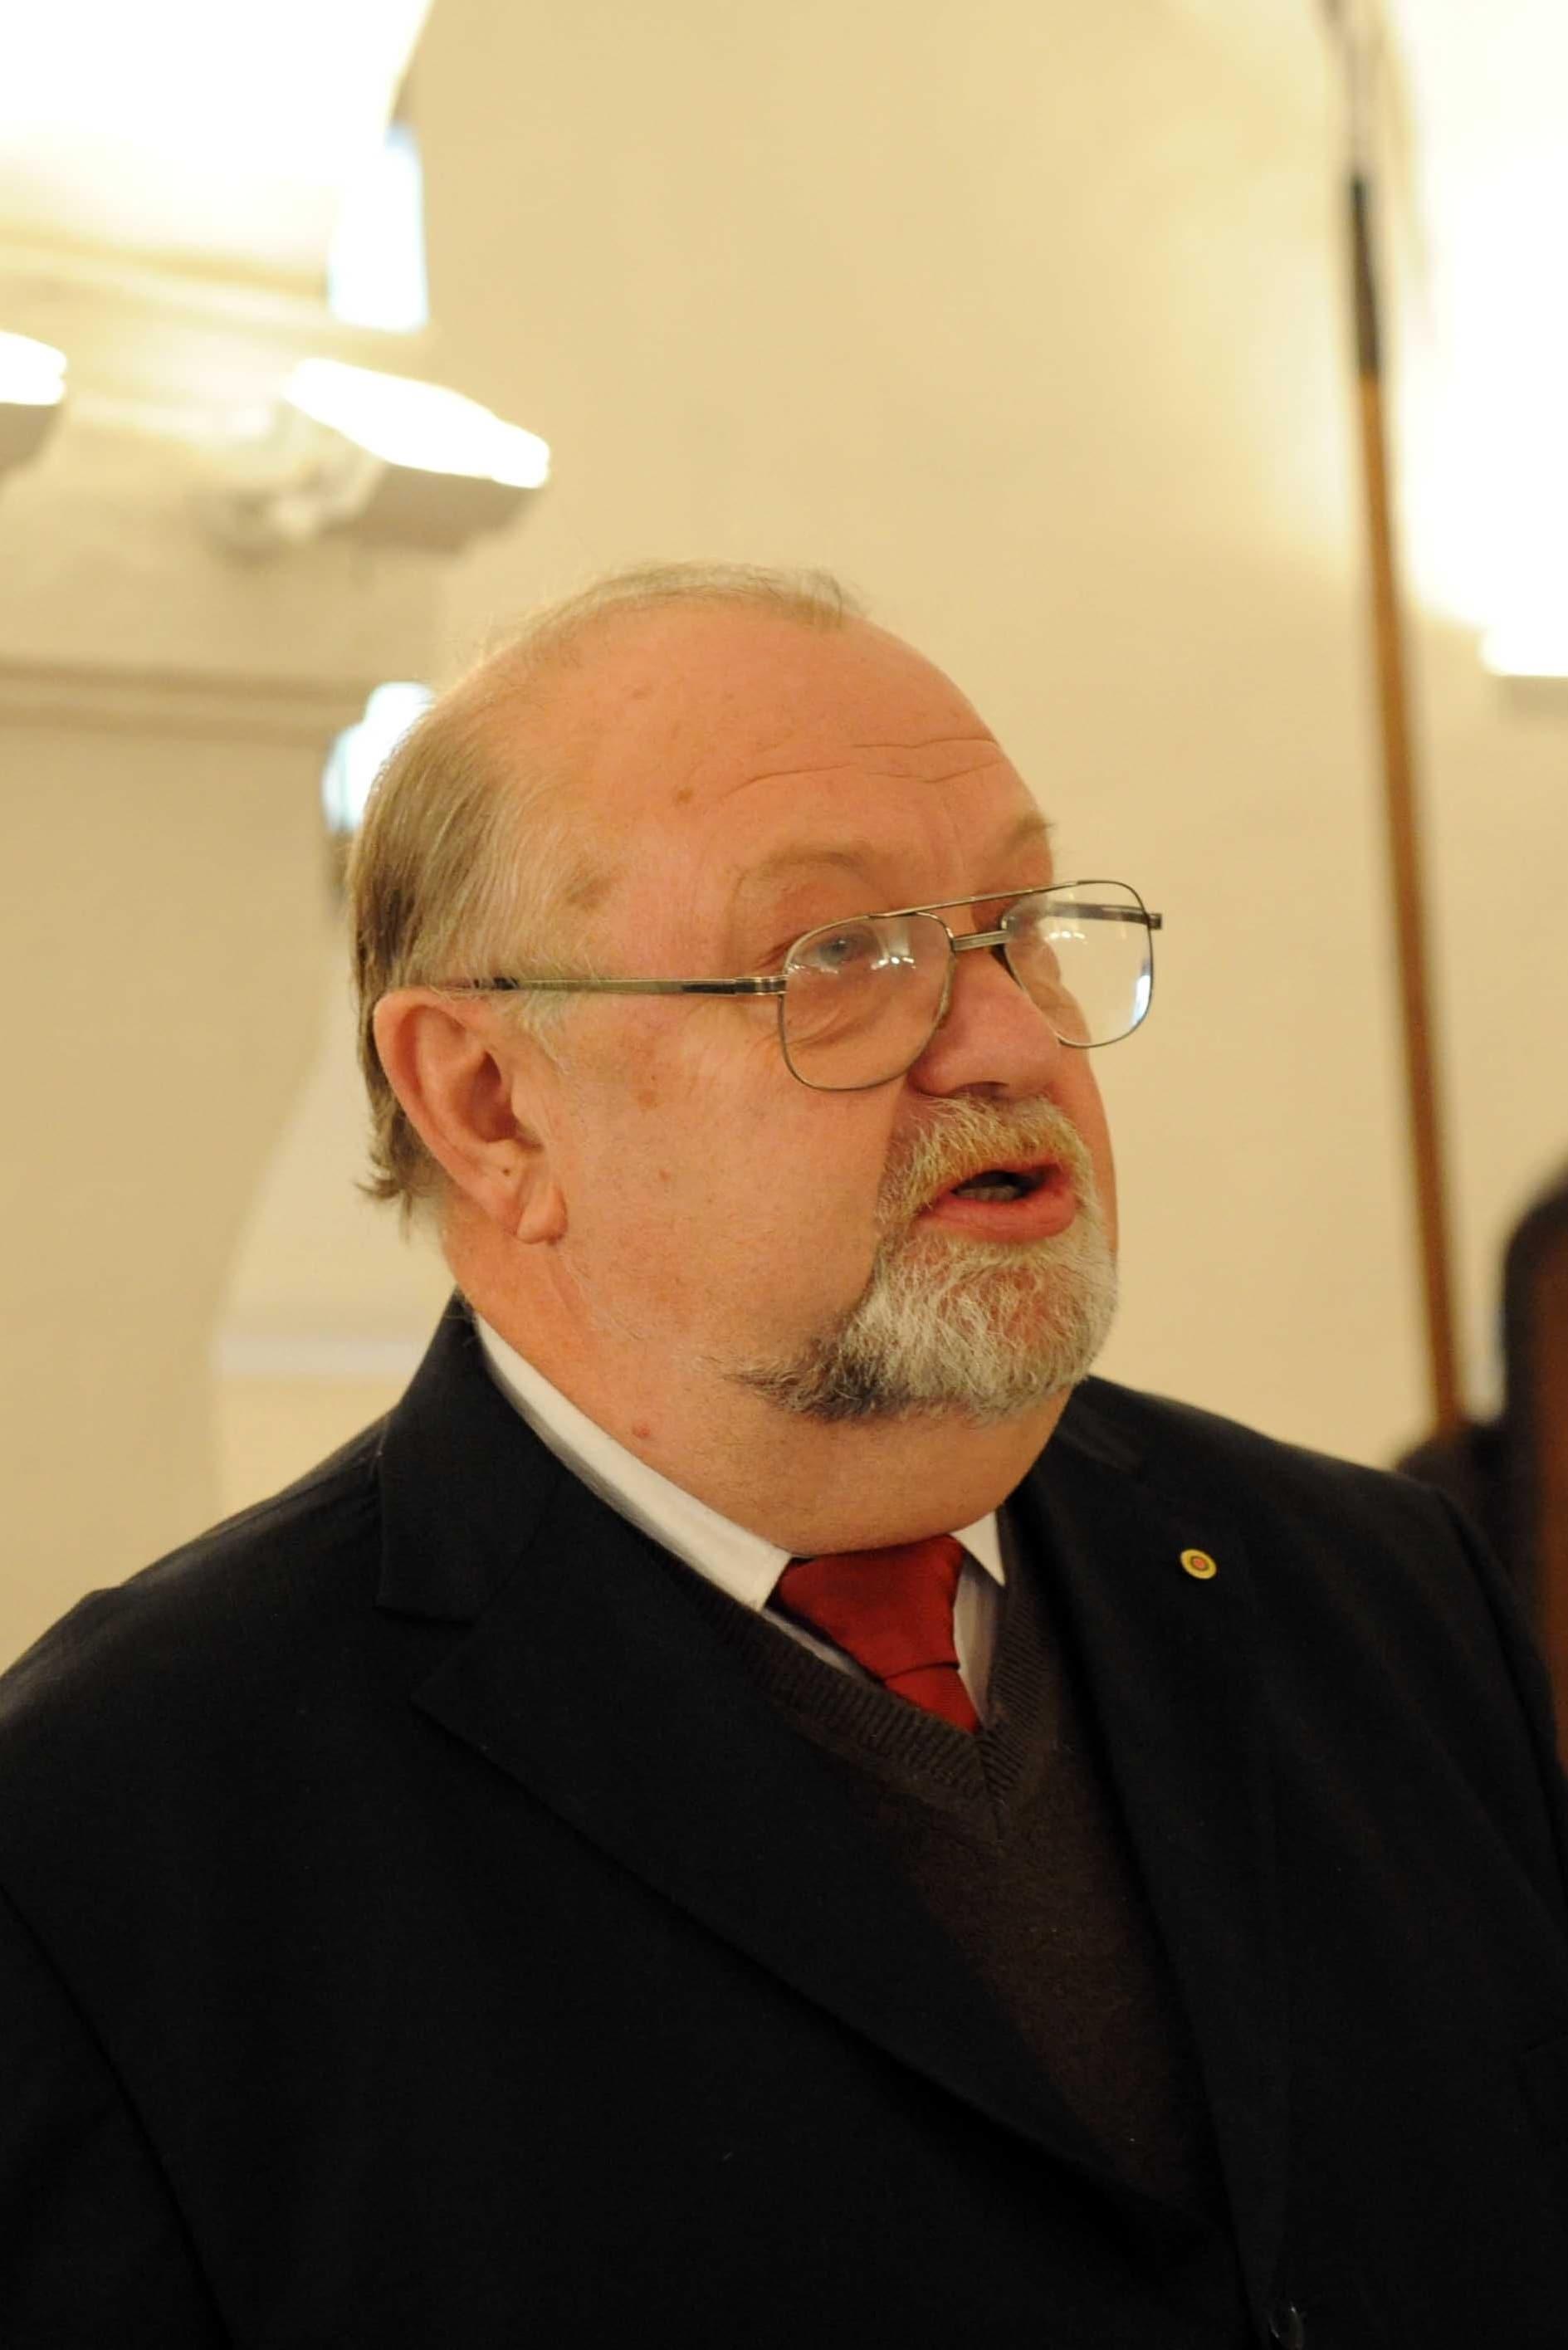 Juozas Širvinskas